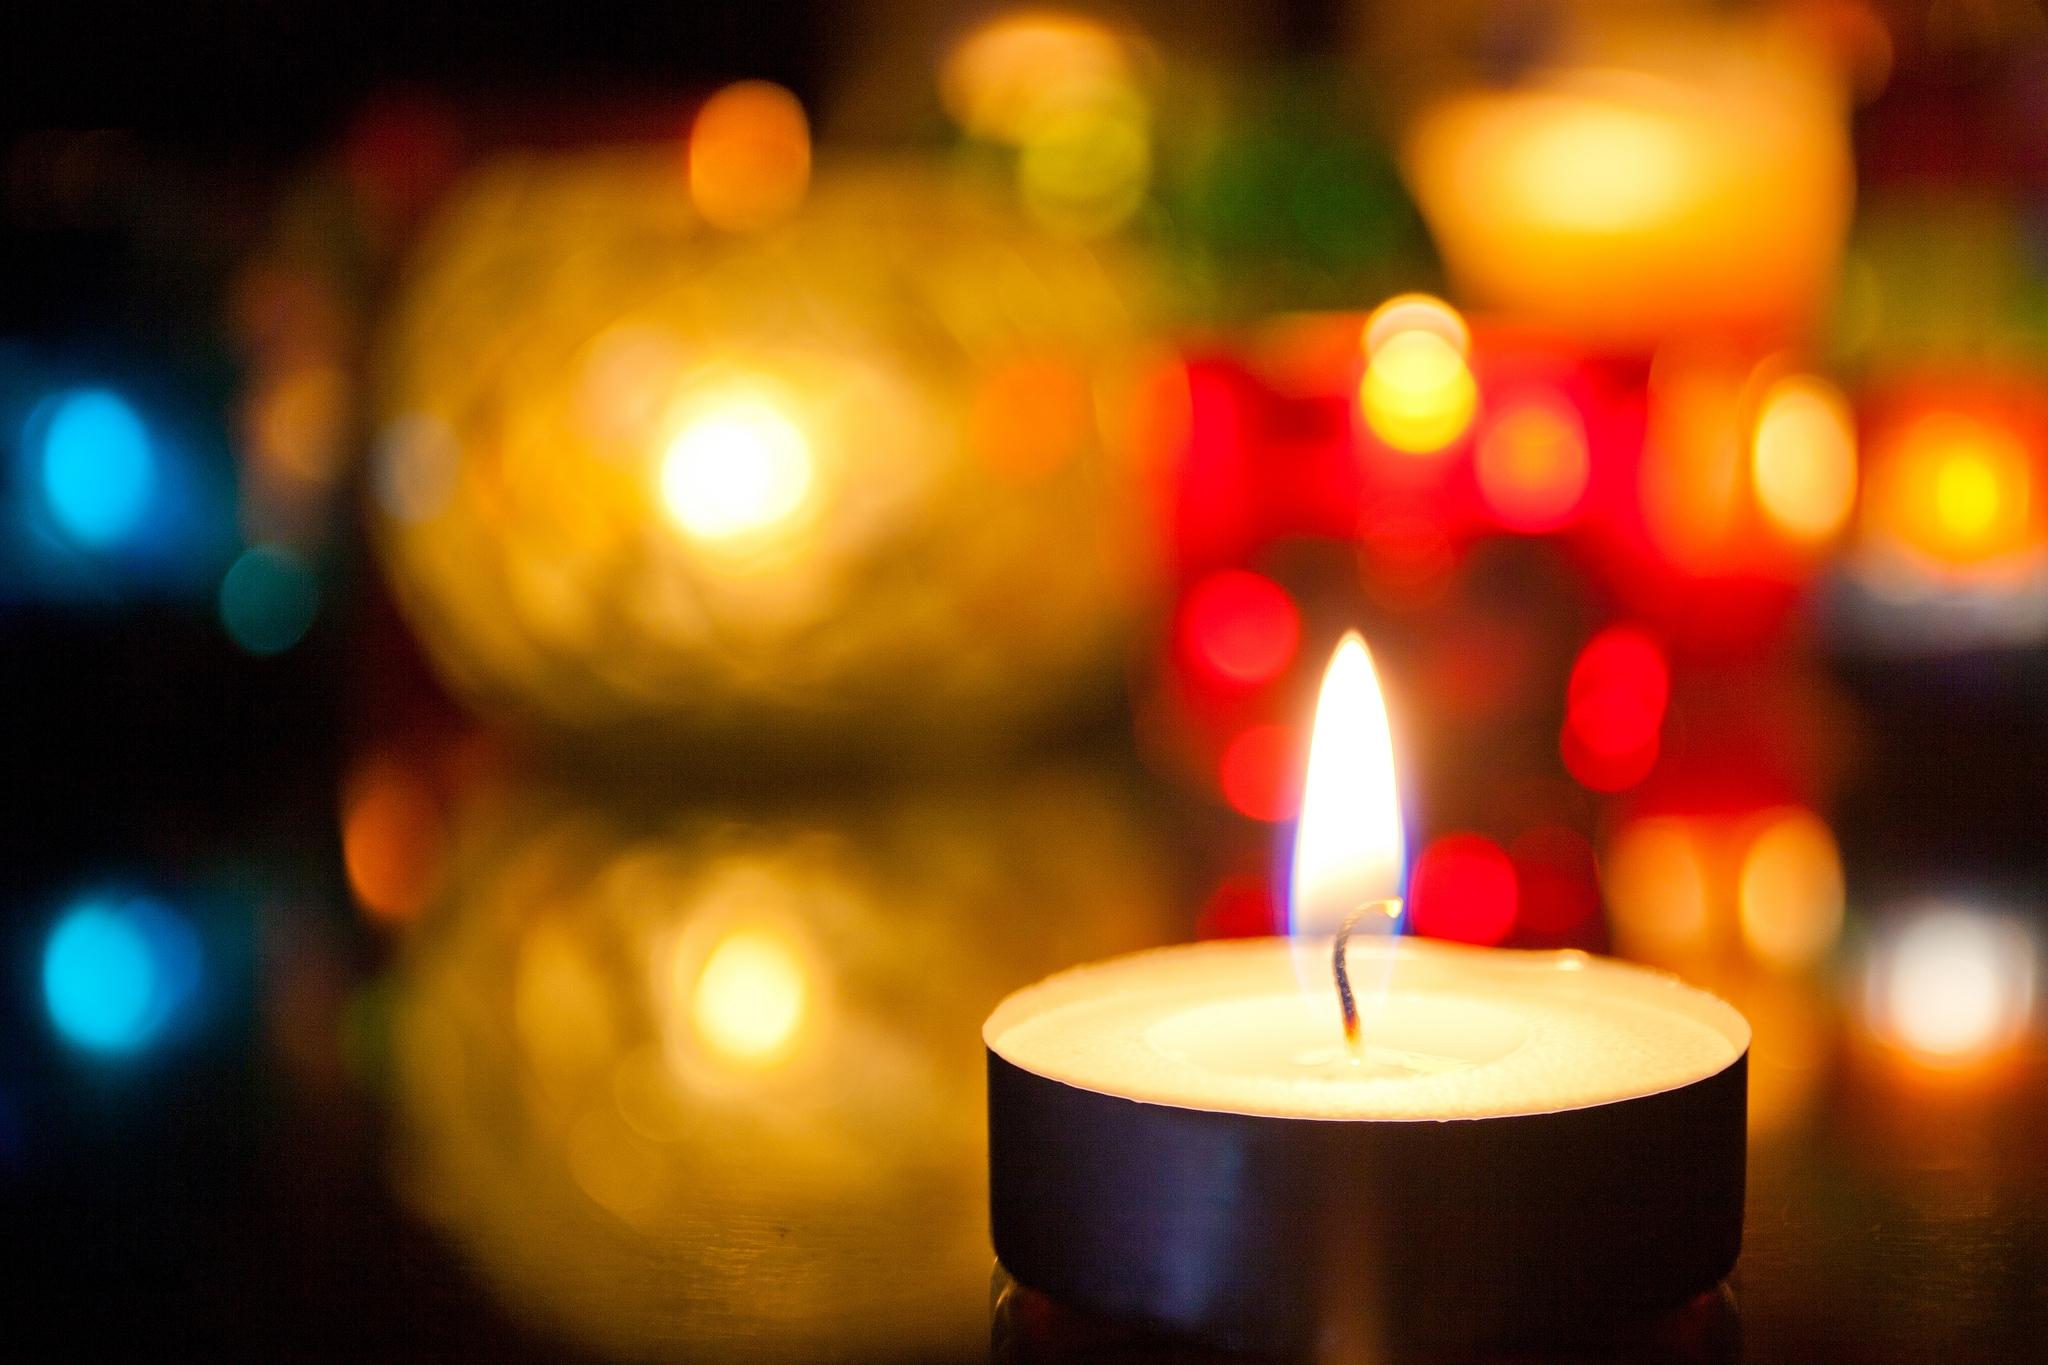 3d Candle Live Wallpaper Candle Wallpaper 16395 2048x1365 Px Hdwallsource Com